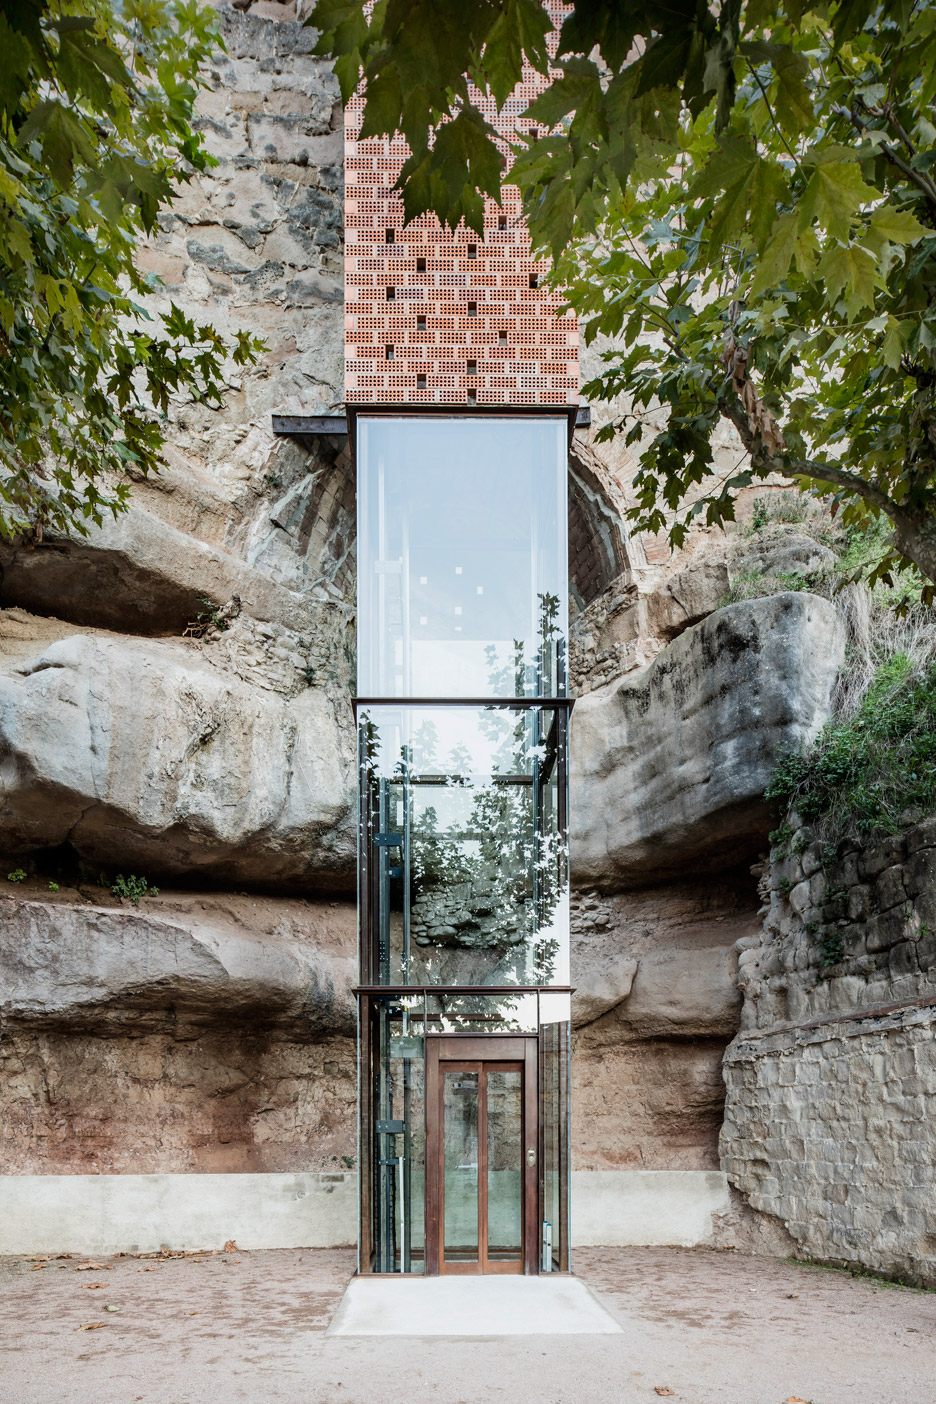 New-Access-to-Gironellas-Historic-Center_Barcelona-Spain_Carles-Enrich_dezeen_936_12.jpg